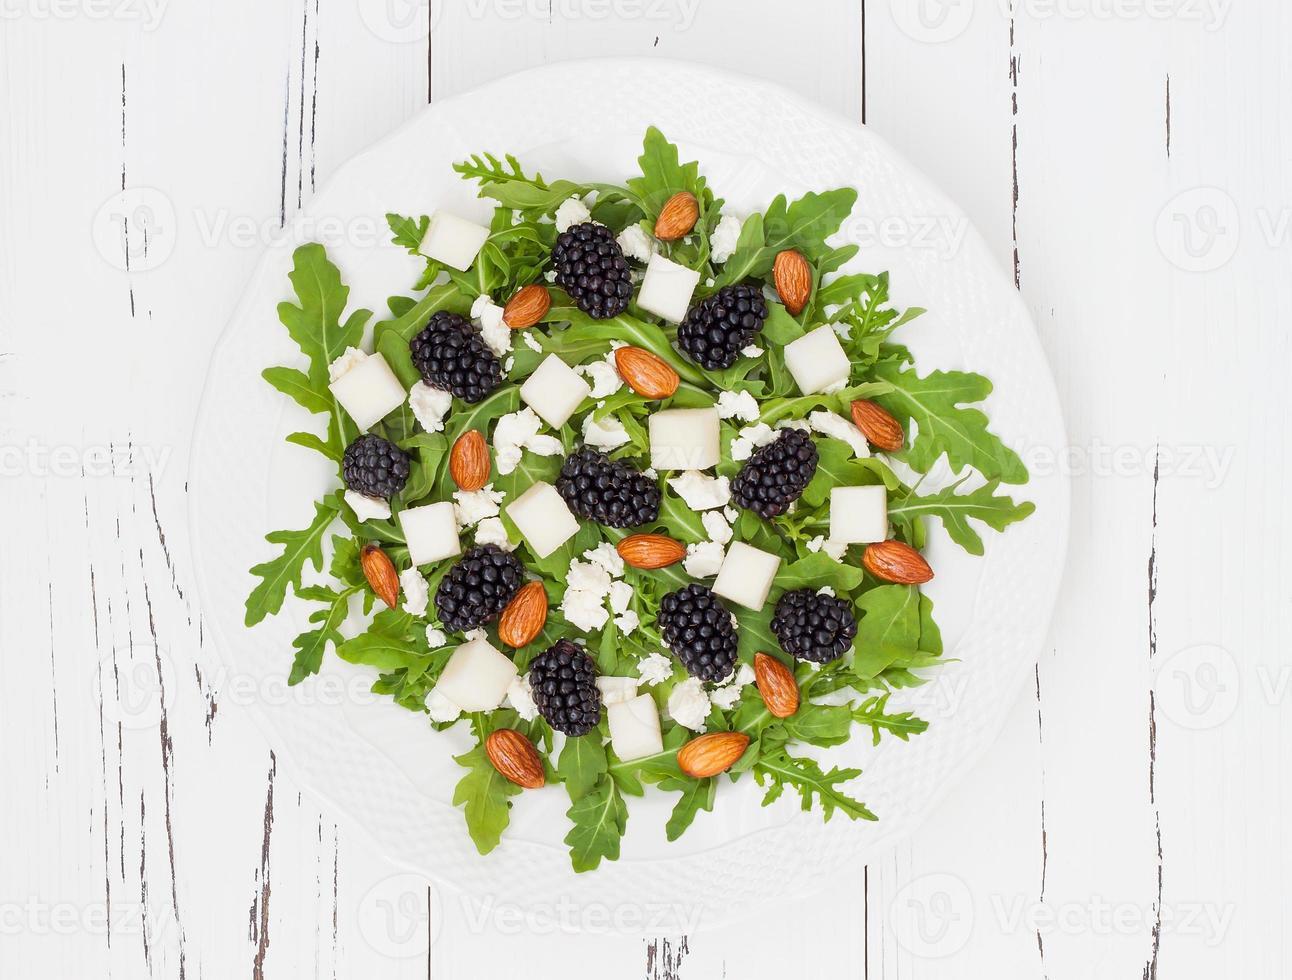 groene salade met rucola, meloen, bramen, amandelen en fetakaas foto